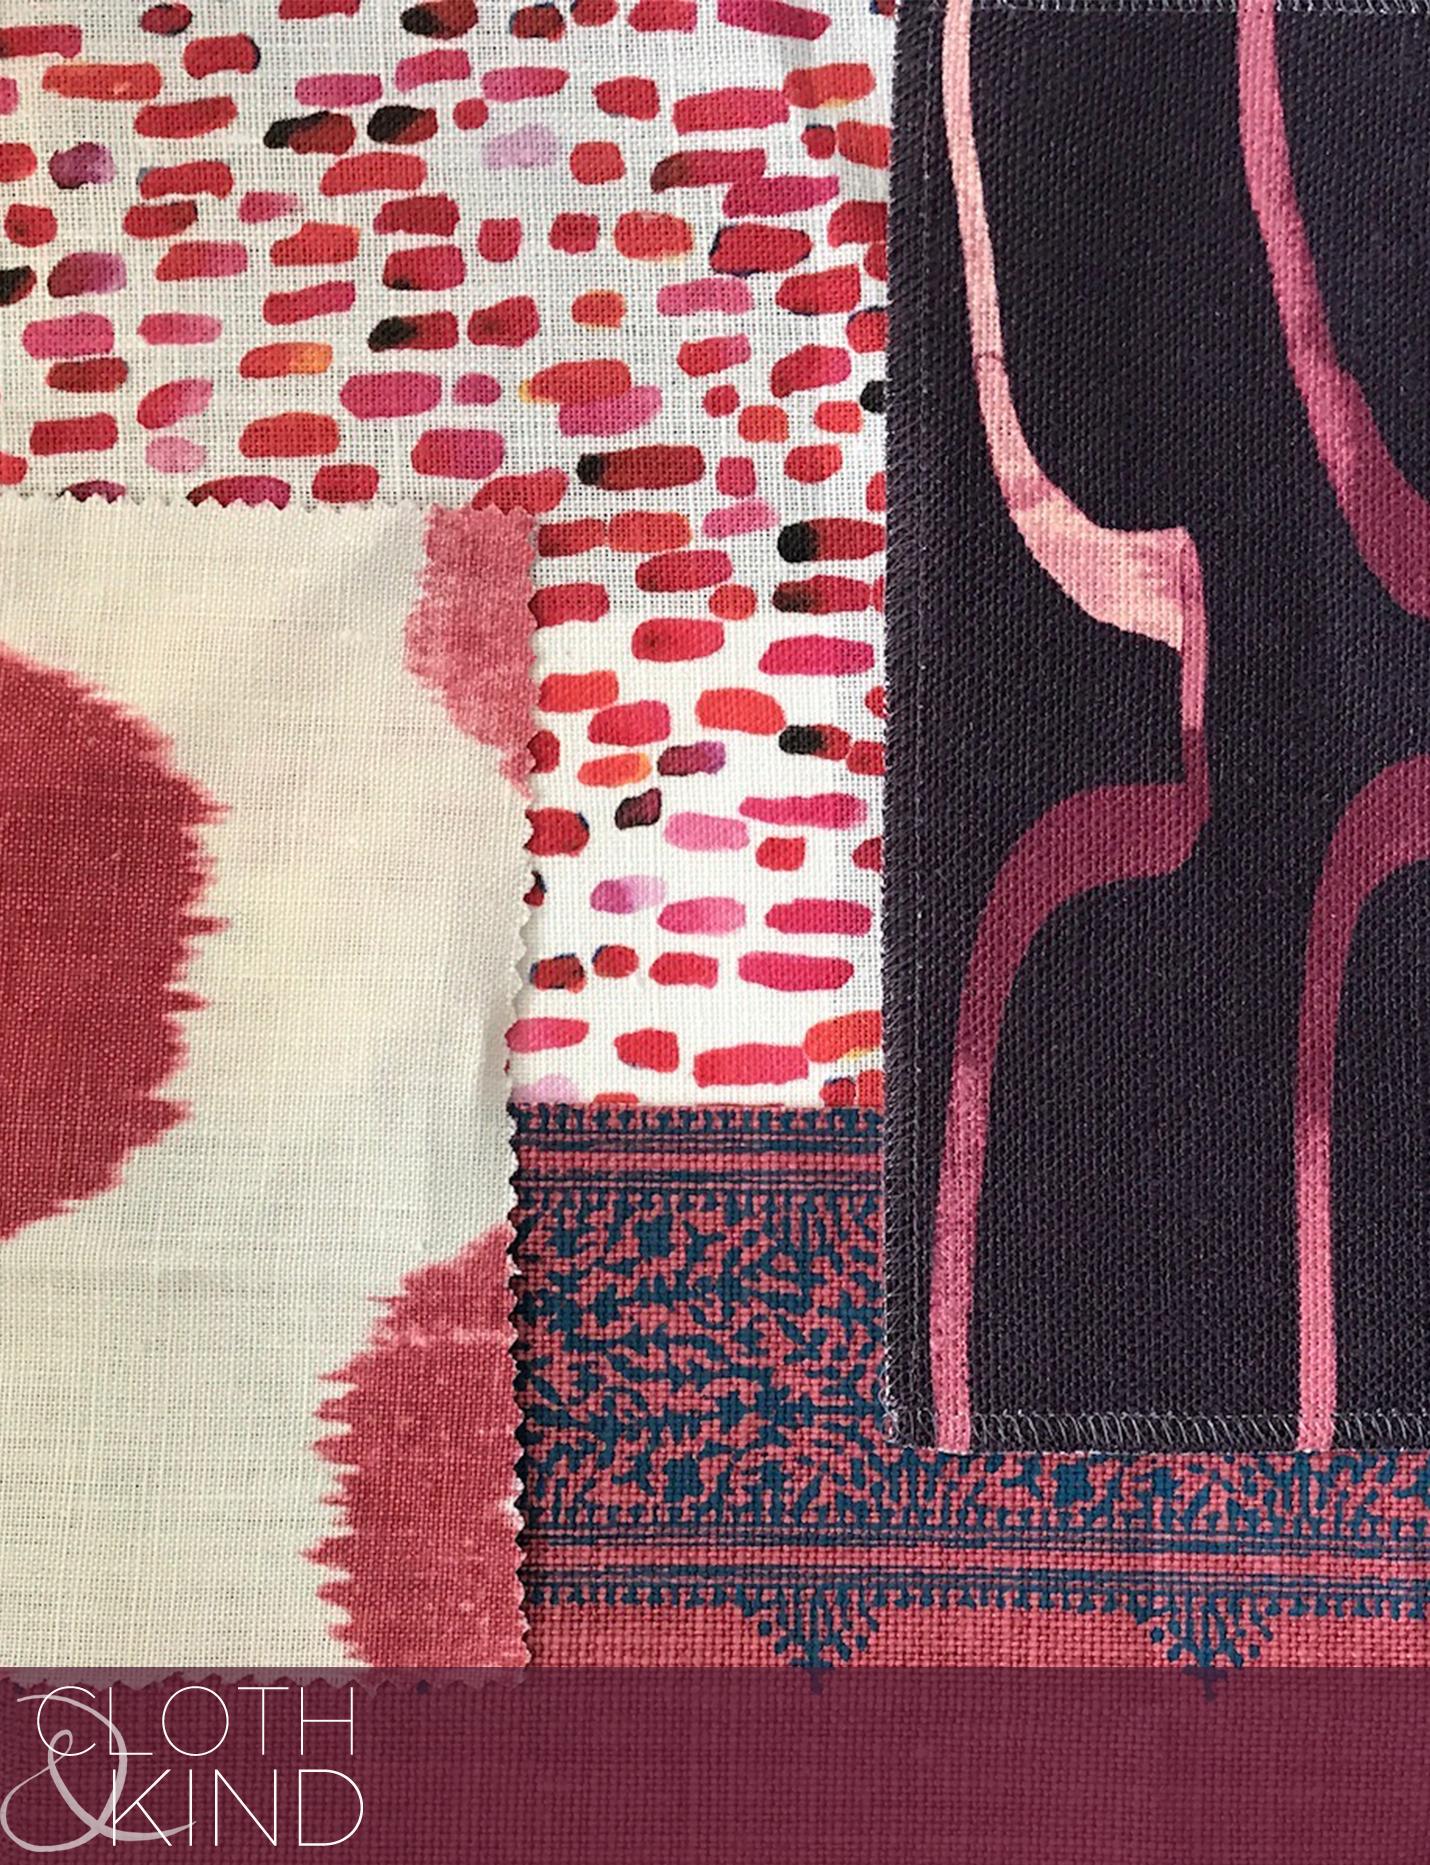 CLOTH & KIND Interiors // Palette No. 57